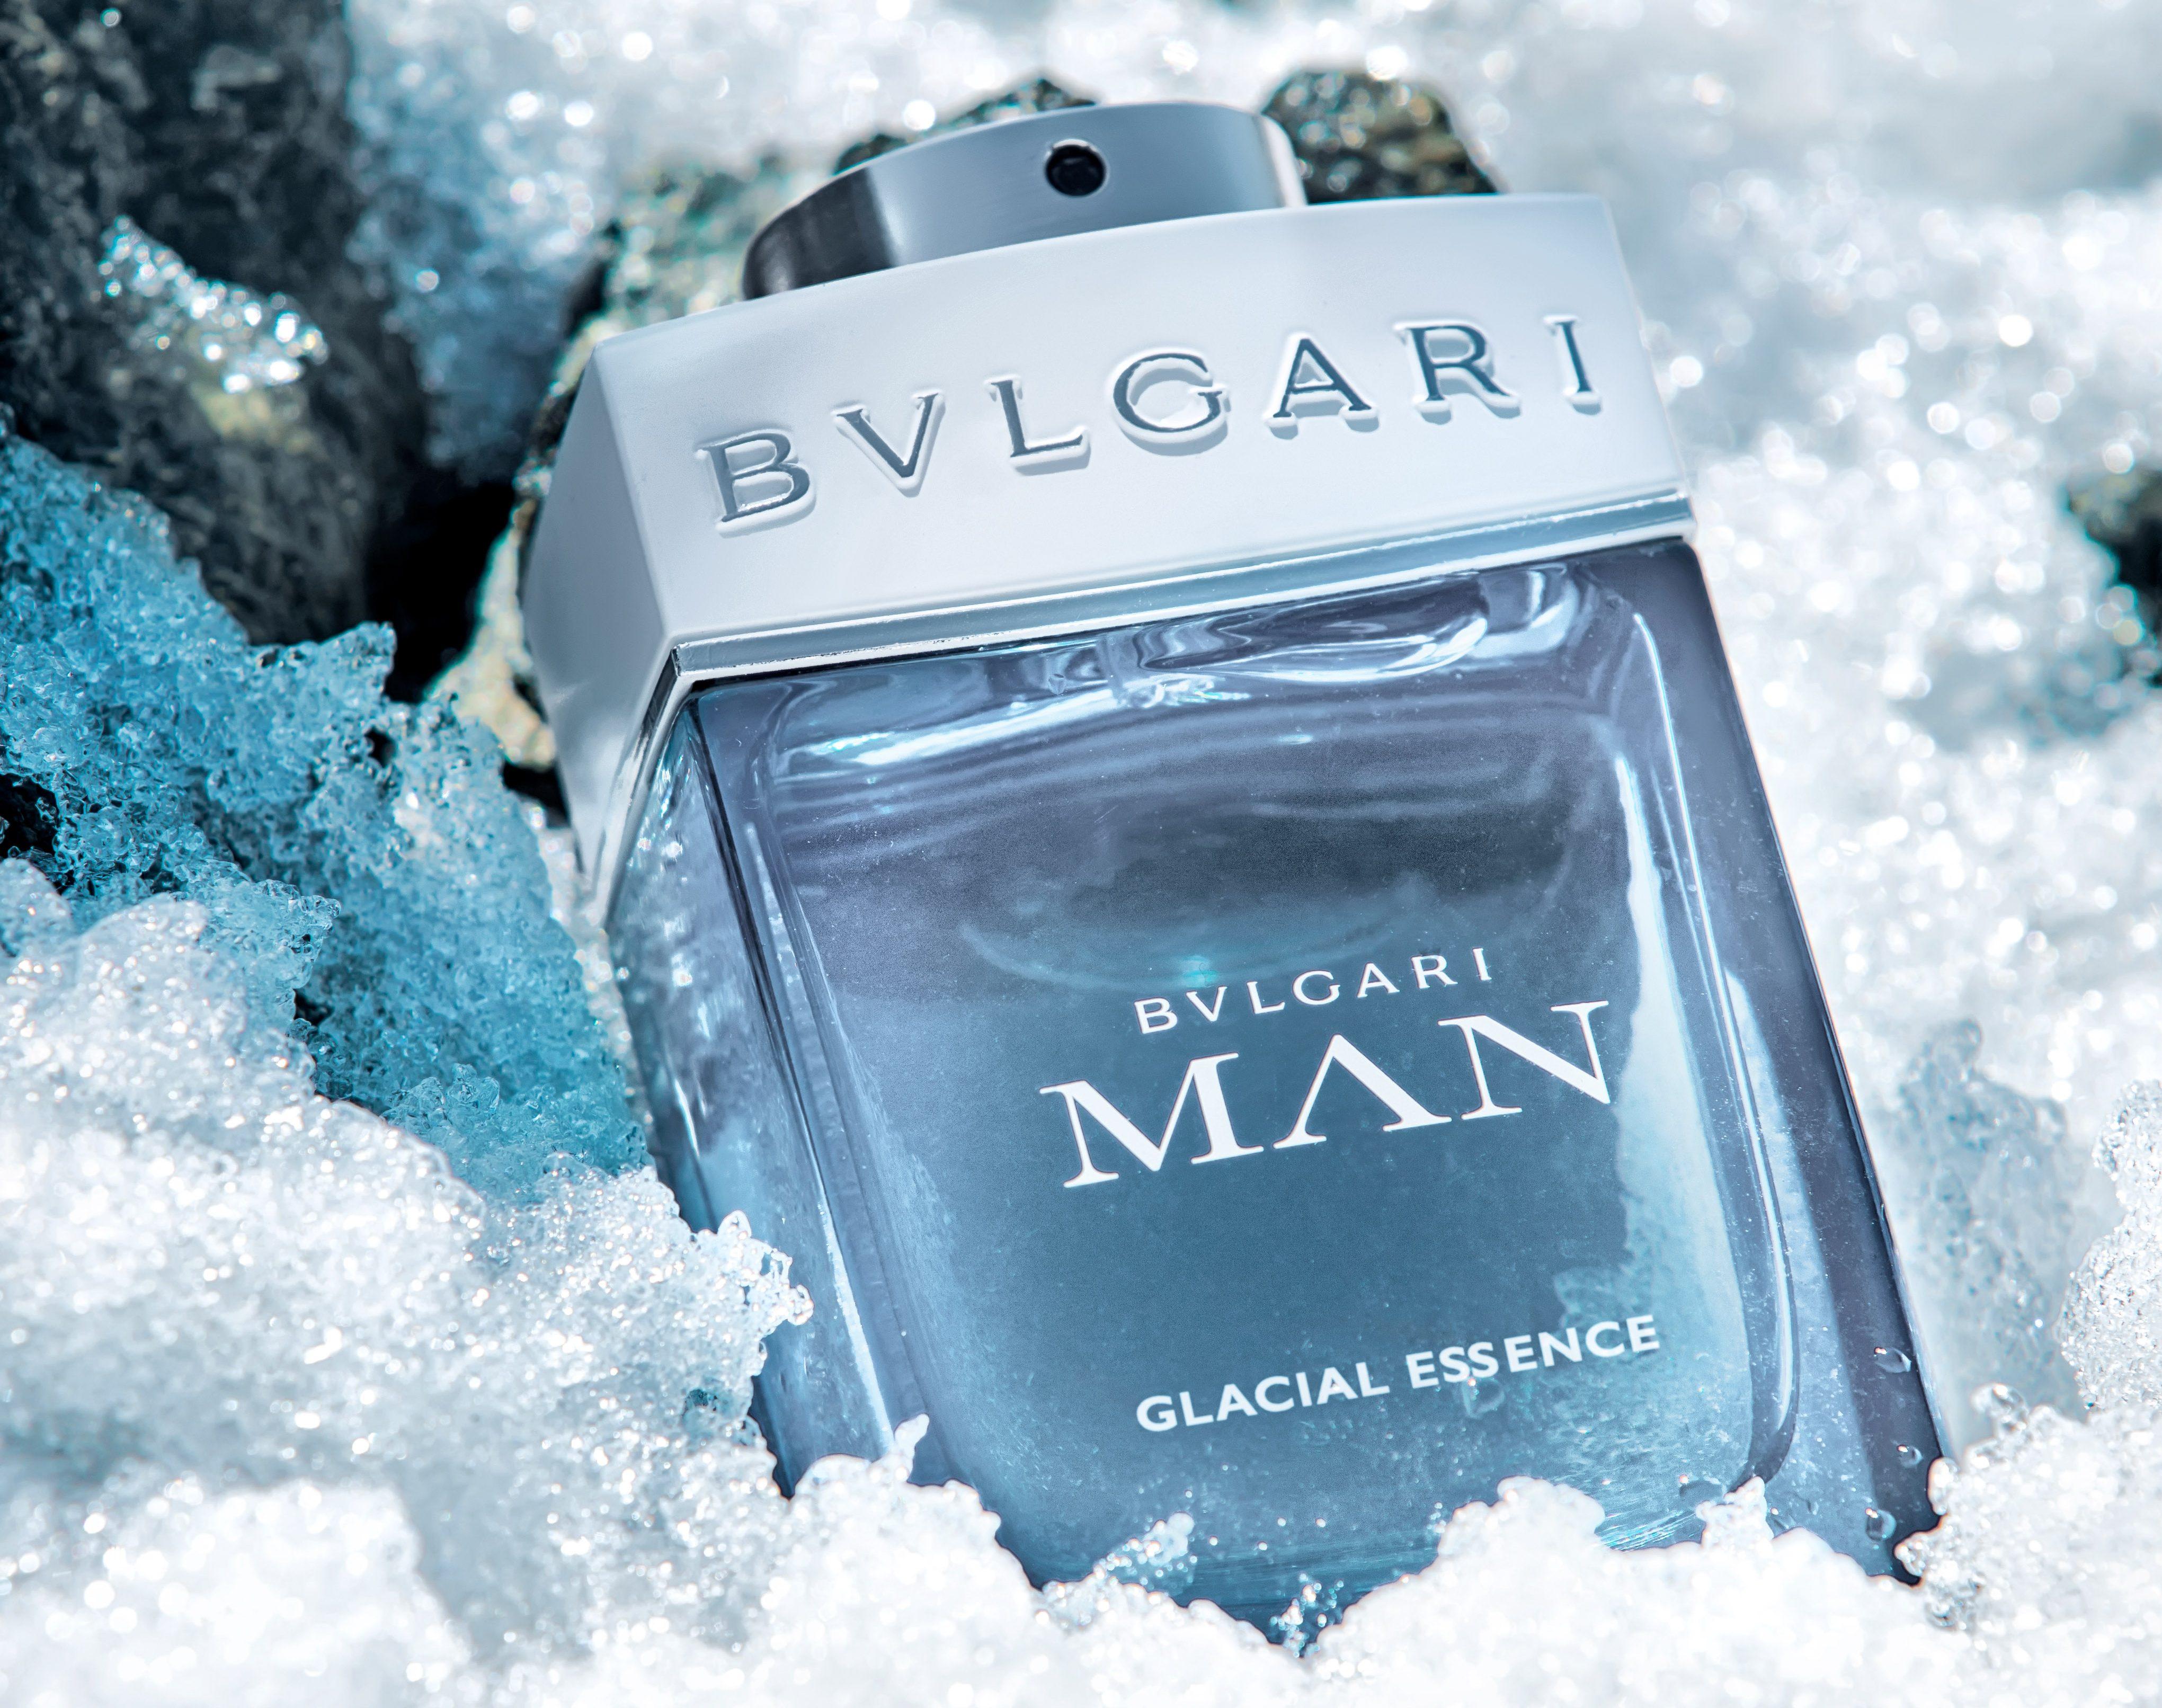 Bulgari Man Glacial Essence